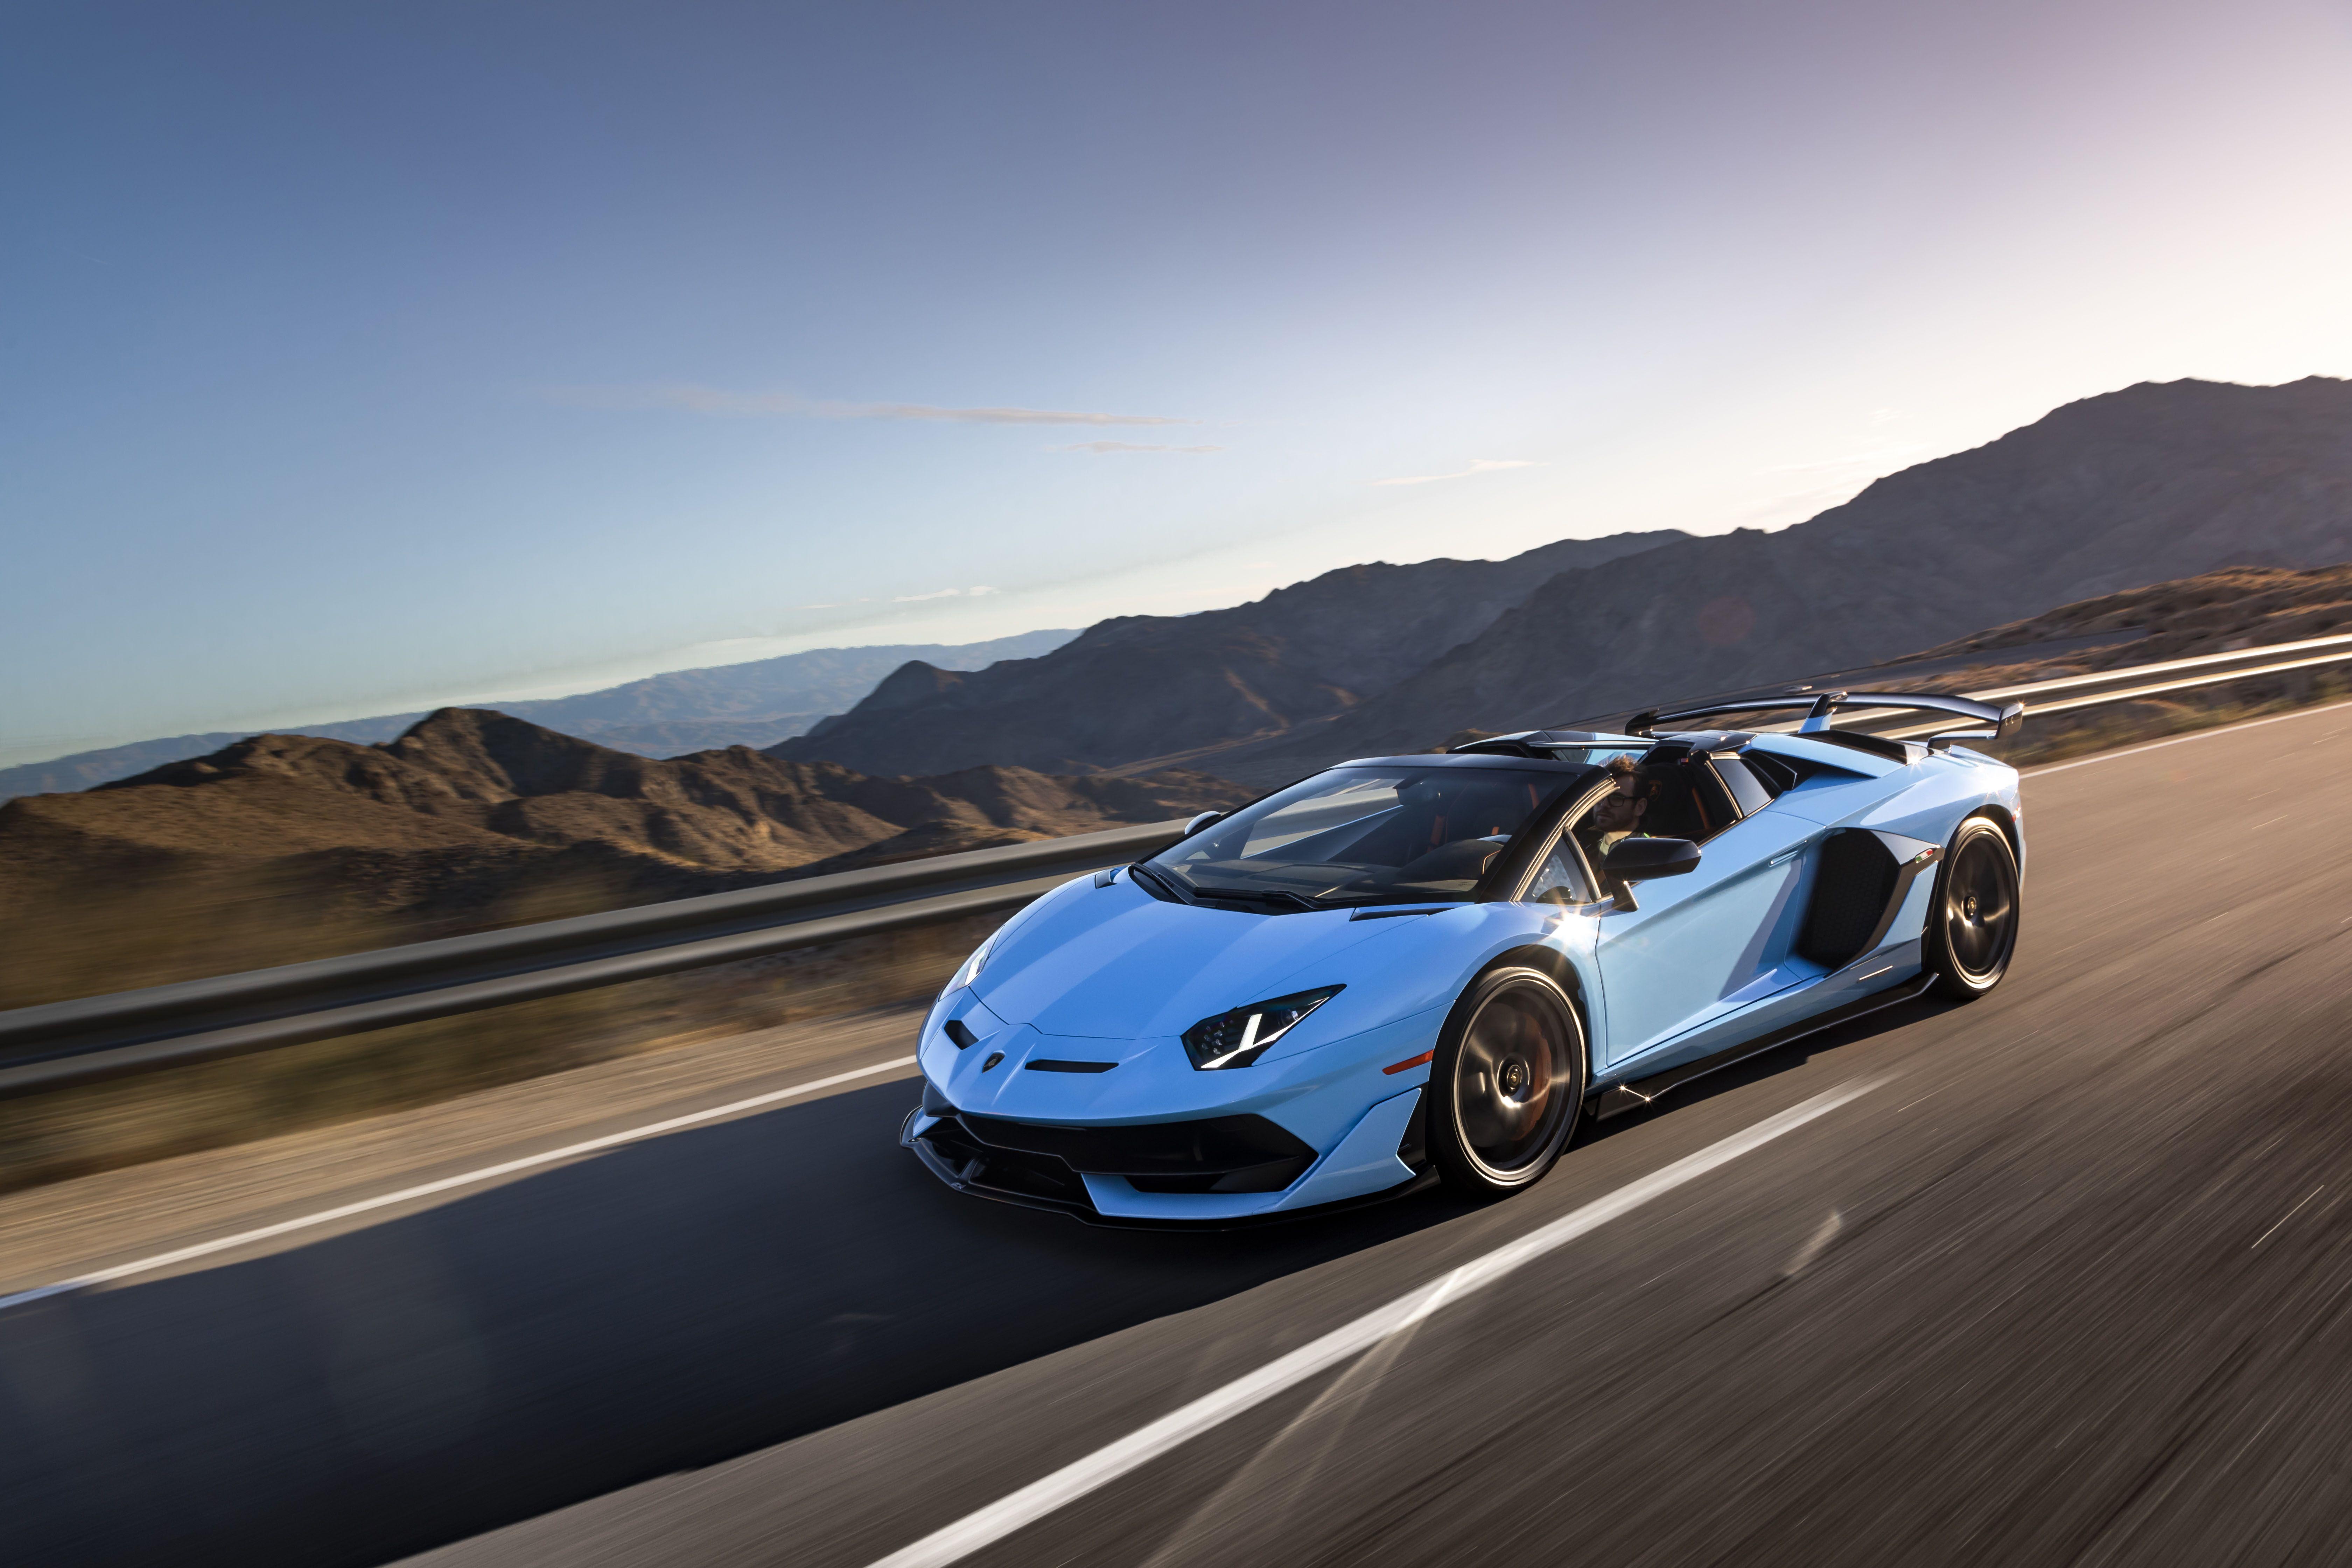 The Lamborghini Aventador SVJ Roadster Is the Ultimate